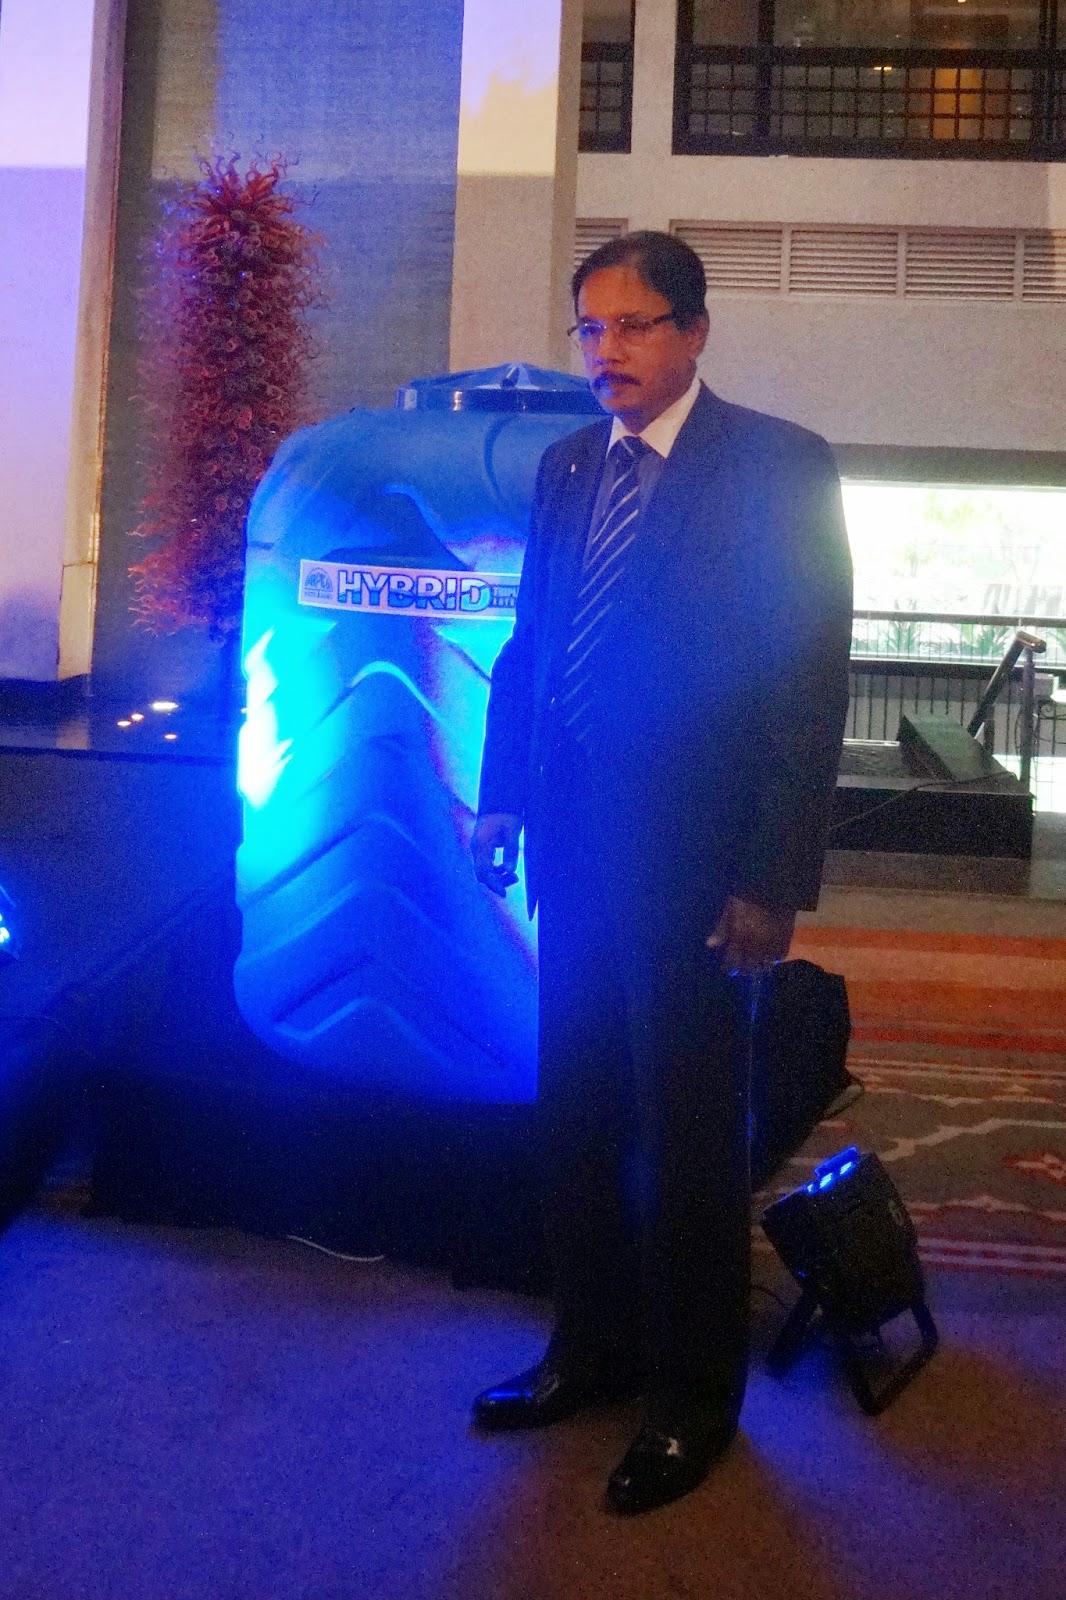 Arpico Hybrid water tank